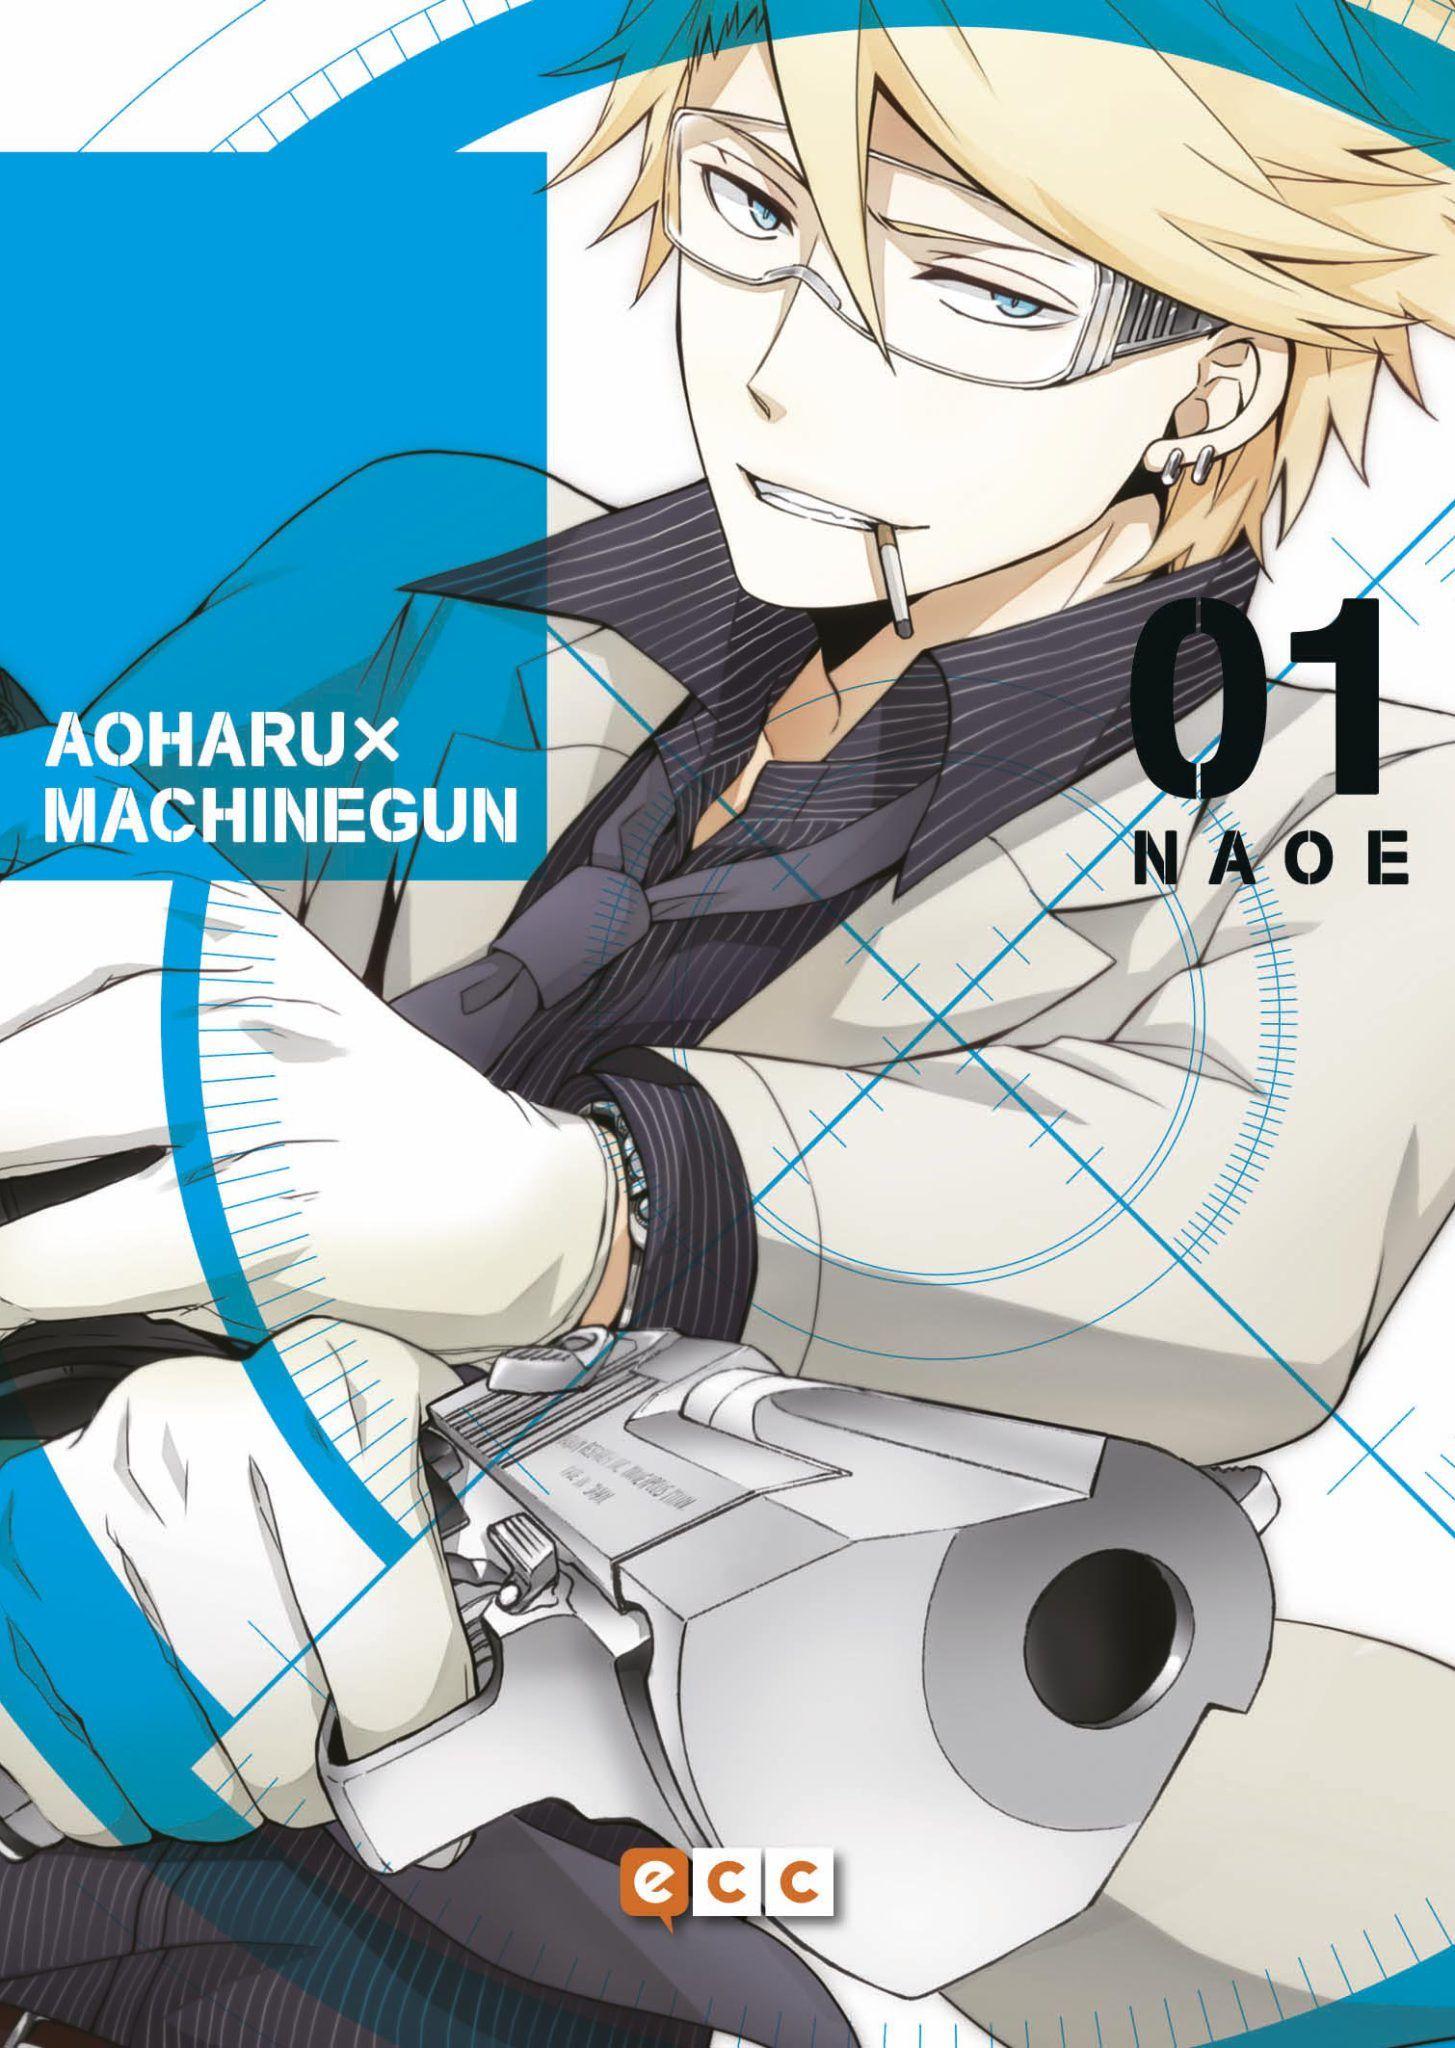 sobrecubierta_aoharu_x_machinegun_num1_WEB